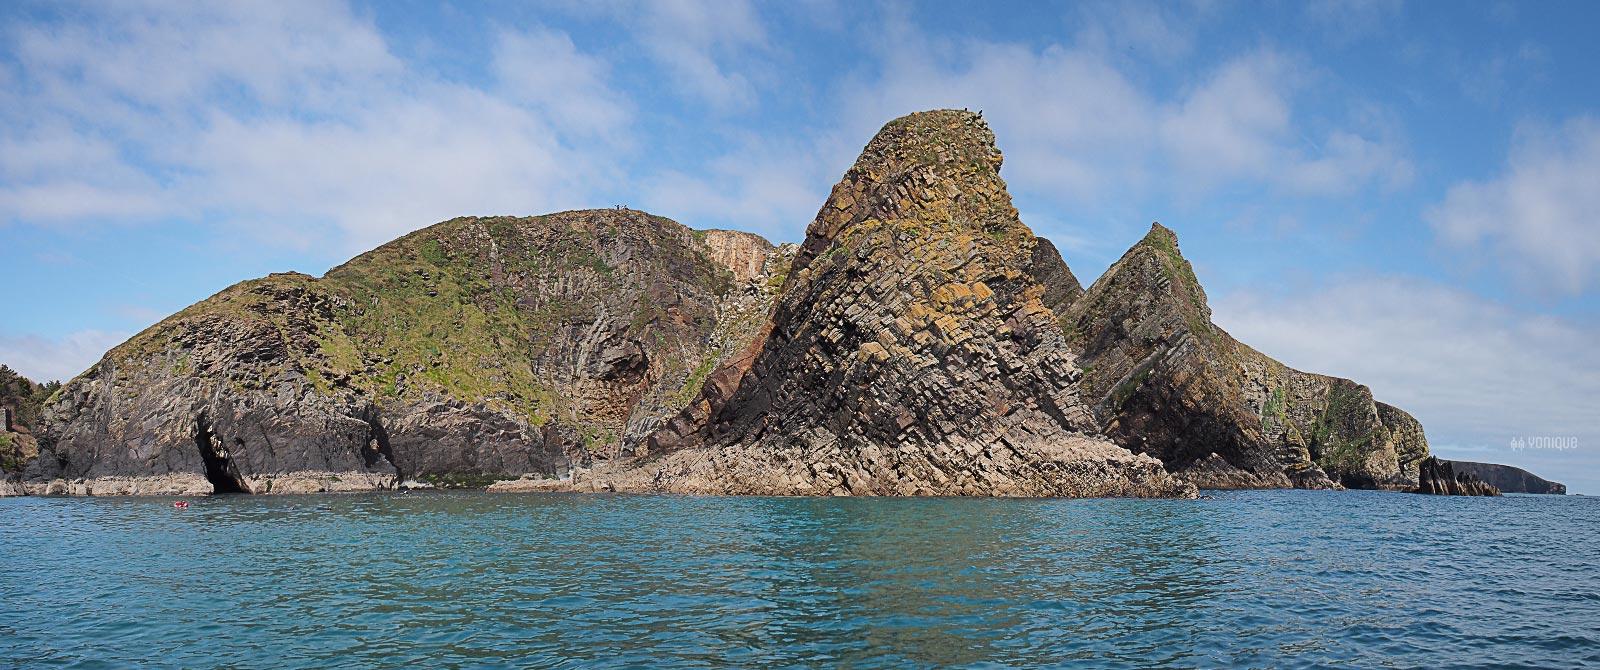 cliffs-nohoval-cove-cork-ireland-yoniquenews